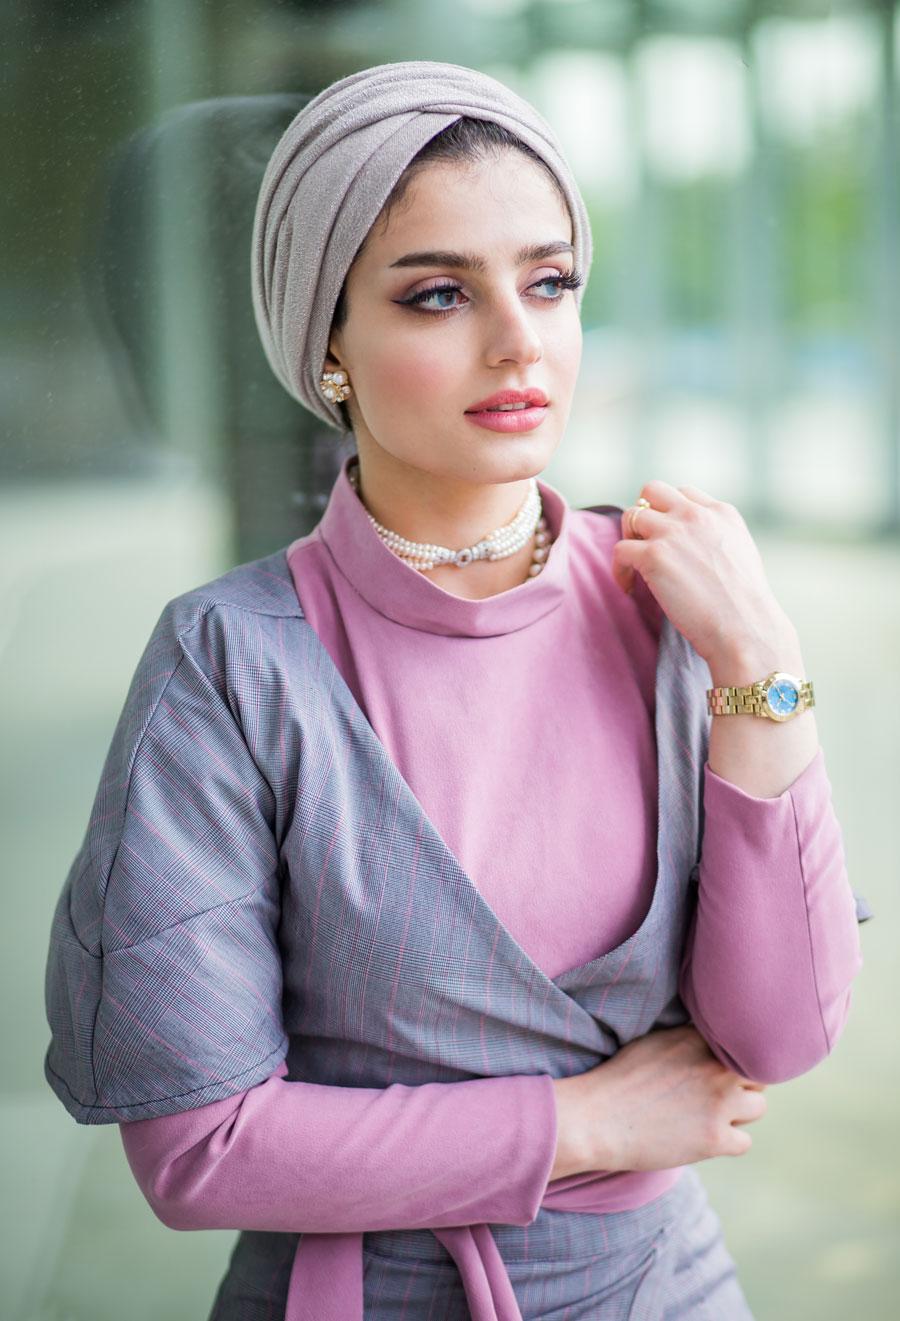 Shahad AlQaysi